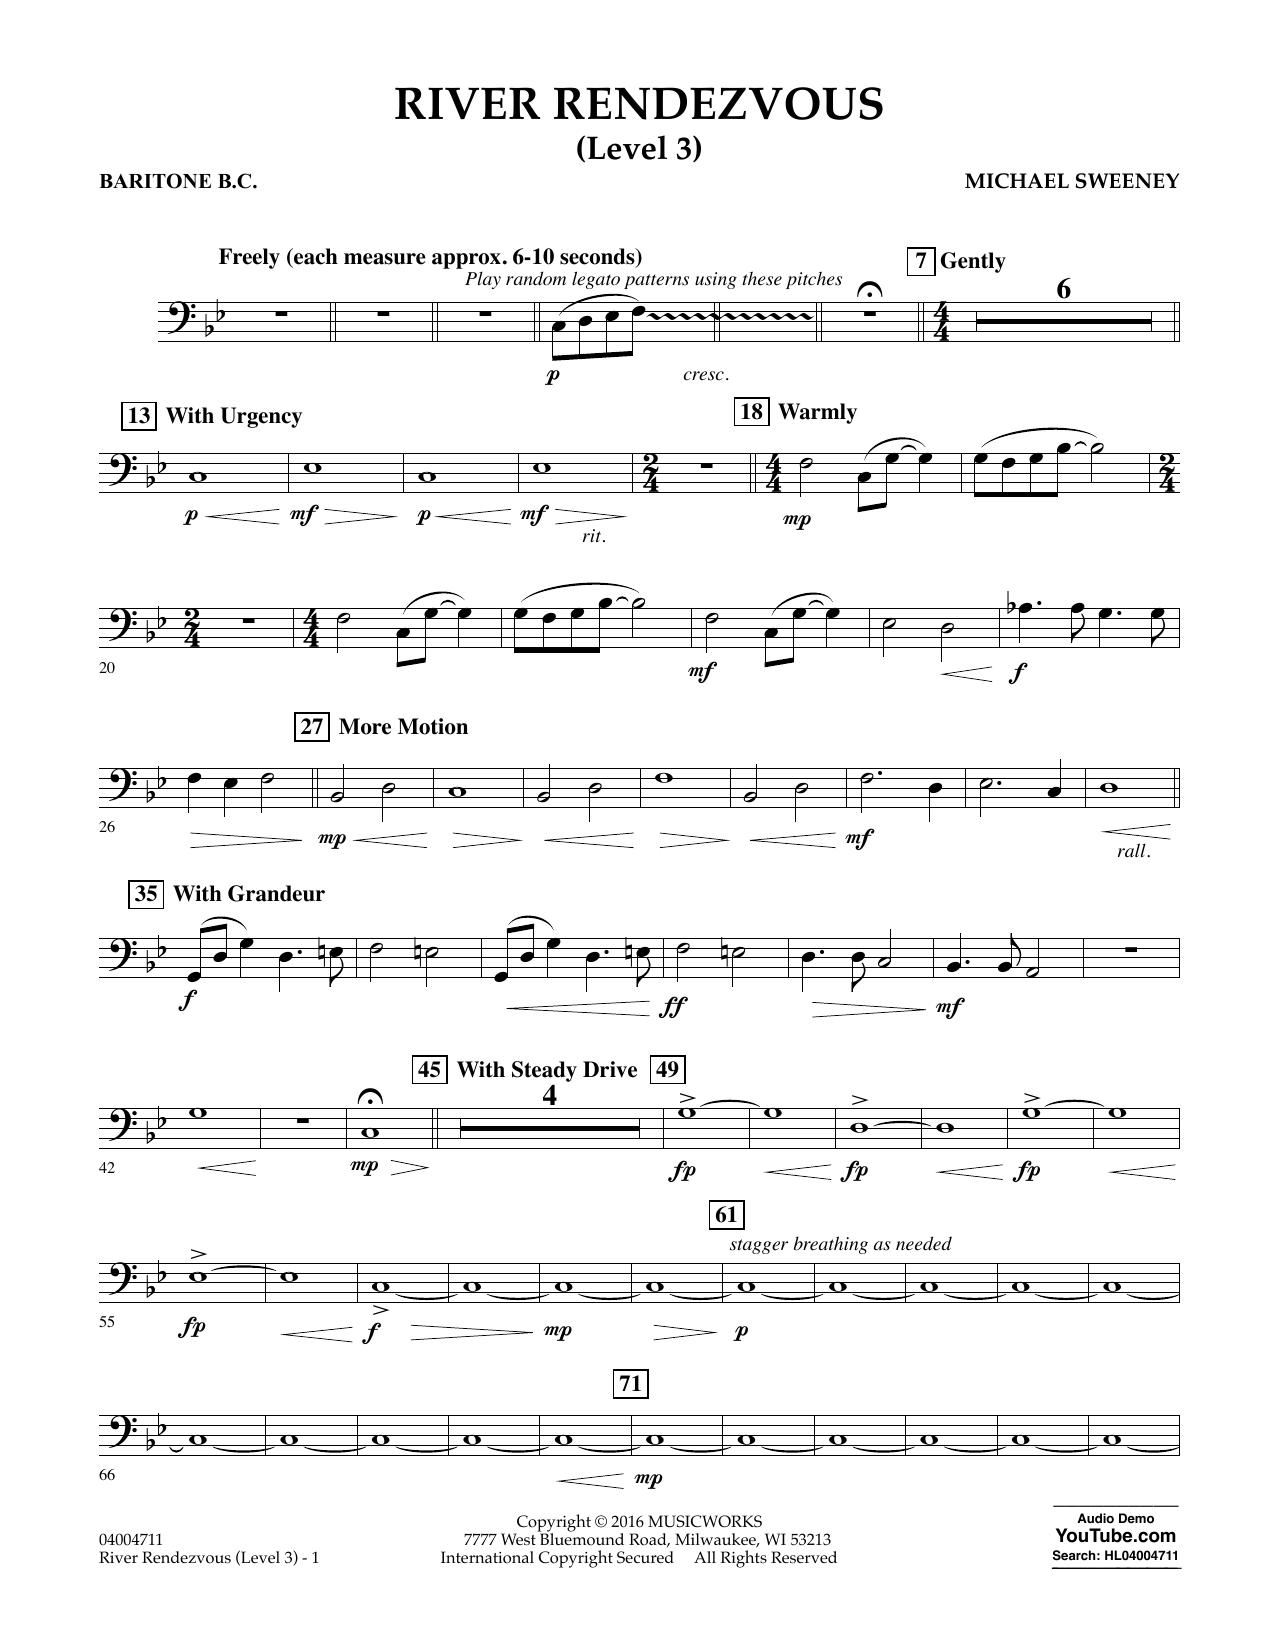 River Rendezvous - Baritone B.C. (Level 3) (Concert Band)